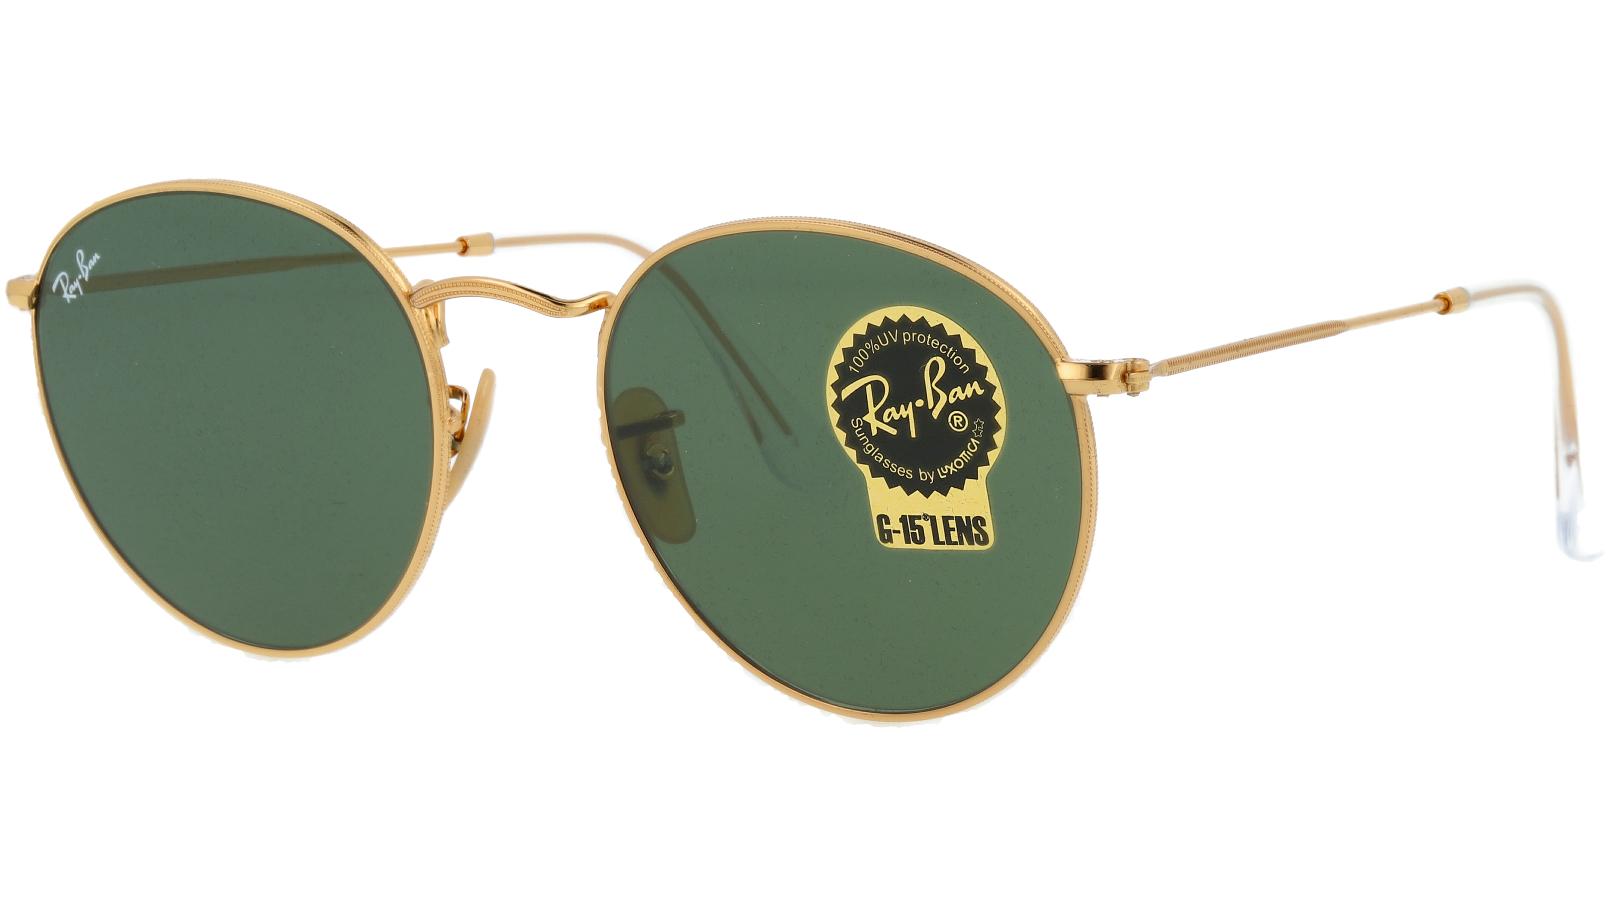 Ray-Ban RB3447N 001 Arista Round Sunglasses